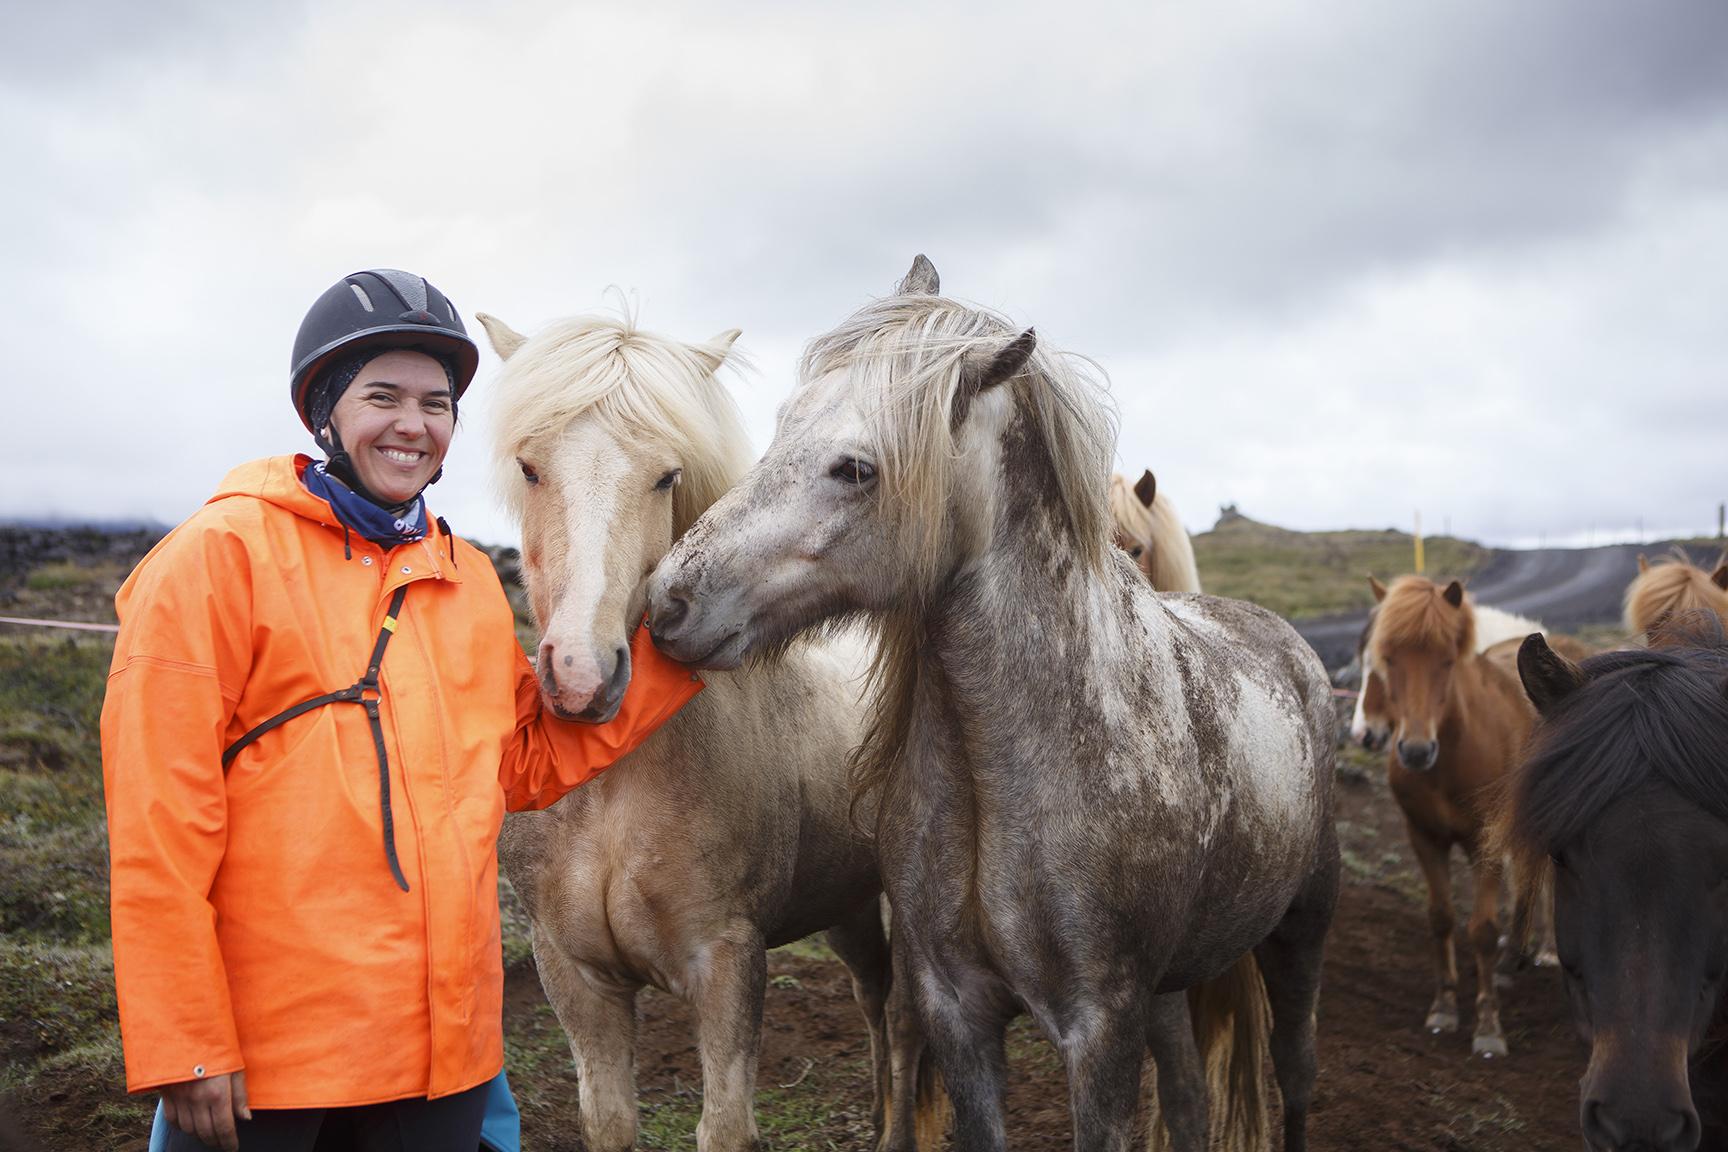 A smiling woman wearing an orange rain coat pets two horses